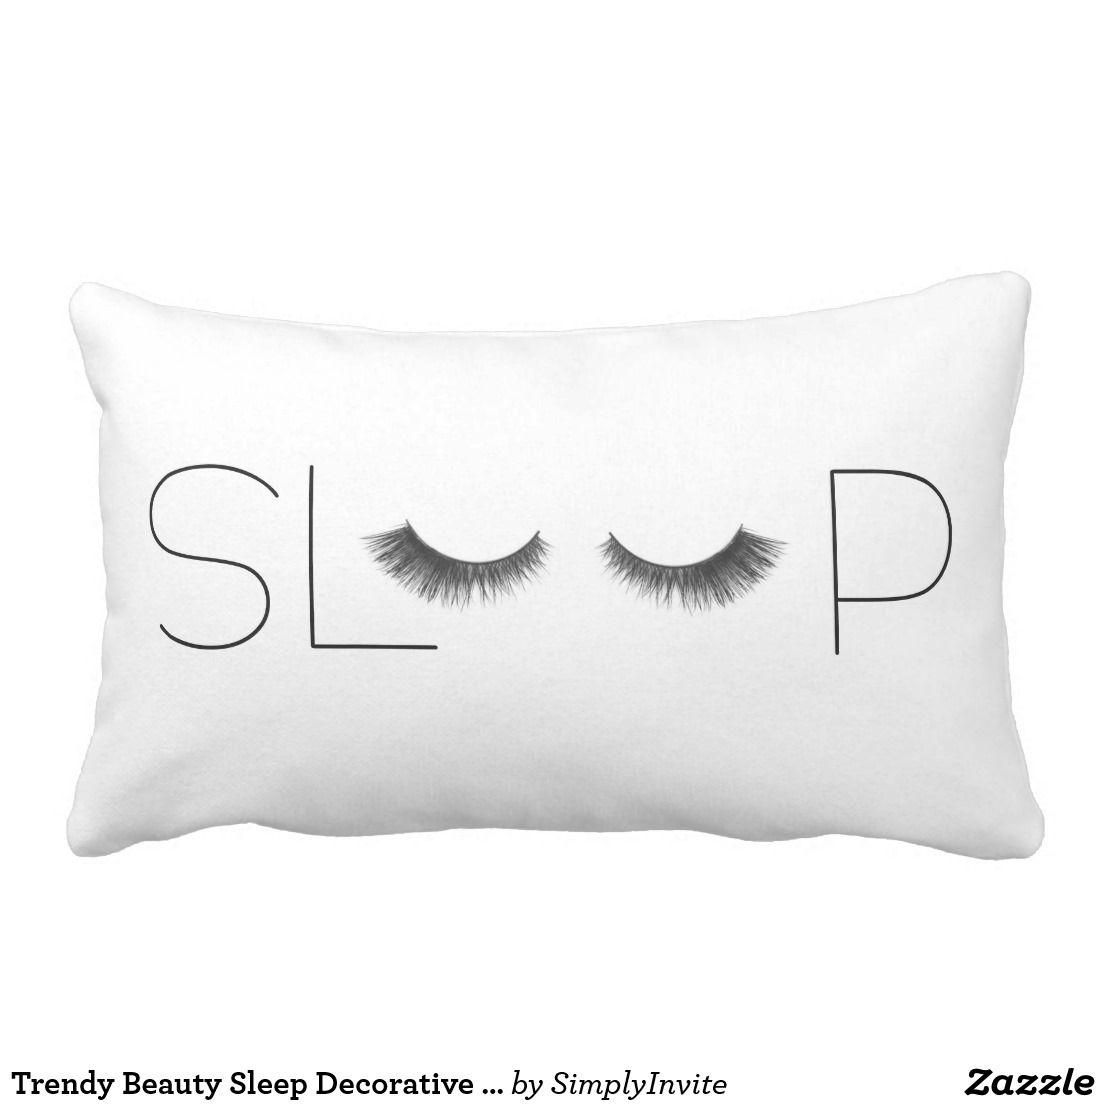 Miraculous Trendy Beauty Sleep Decorative Pillow Zazzle Com Pillows Forskolin Free Trial Chair Design Images Forskolin Free Trialorg